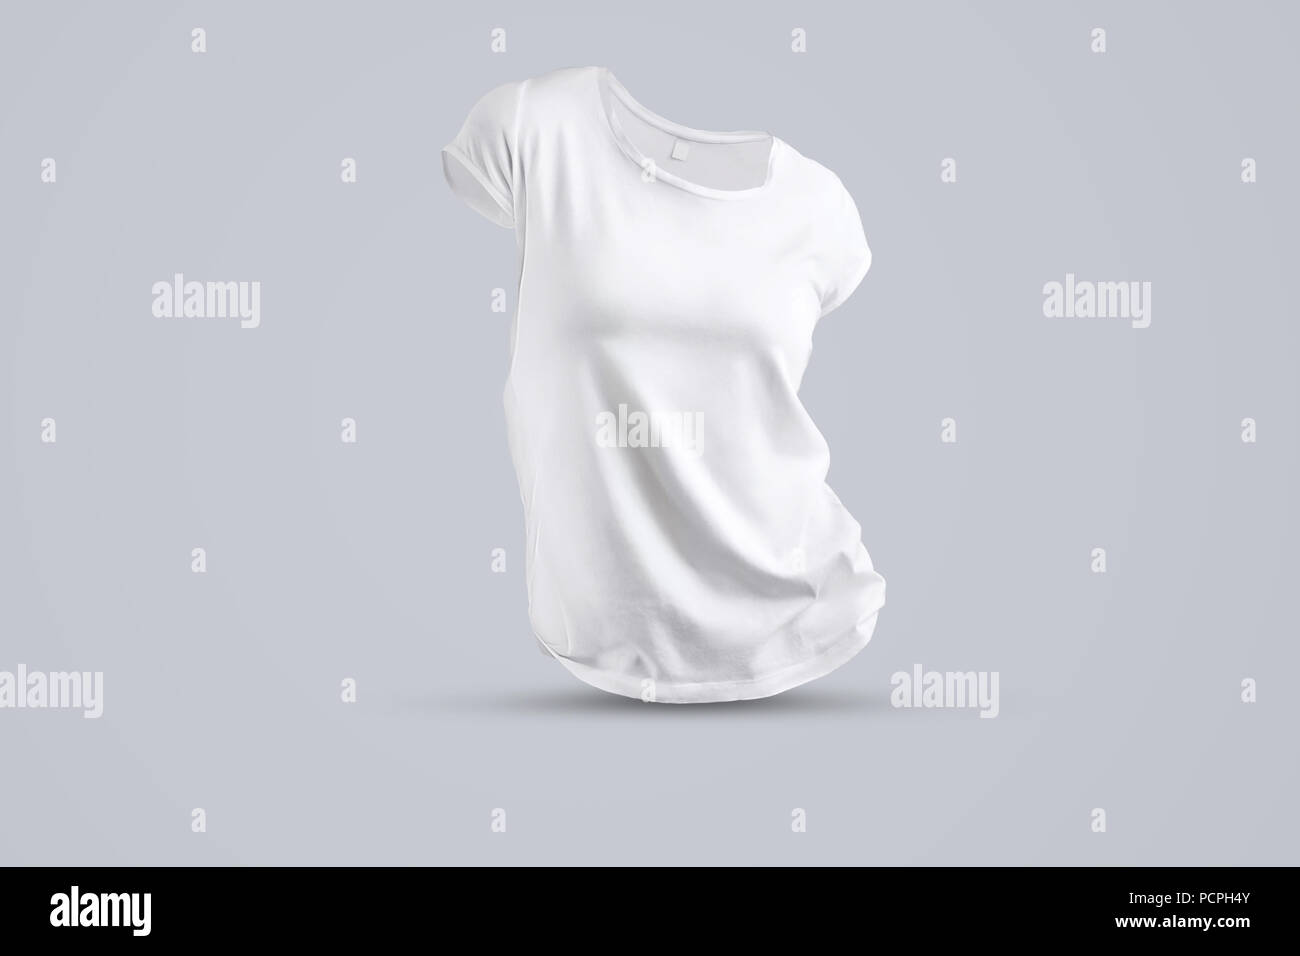 Blank Women T Shirt Template Isolated Stockfotos und -bilder For Blank T Shirt Order Form Template